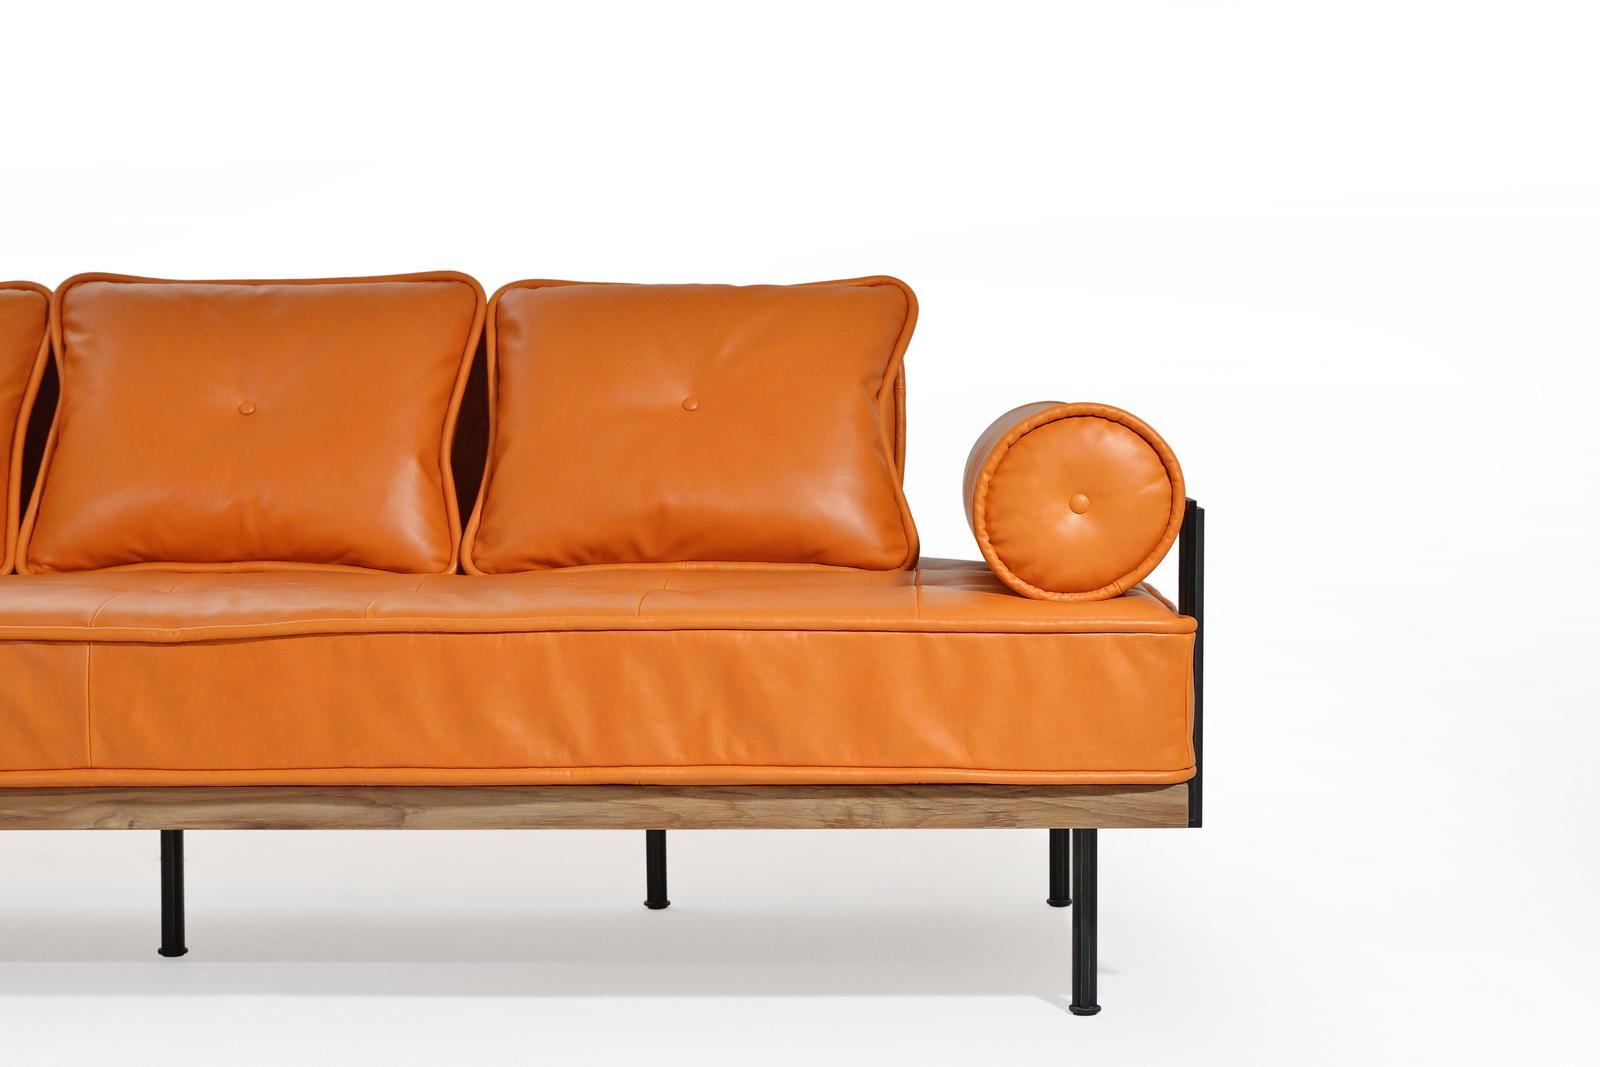 PTendercool-Sofa Corner-BS3-TE-BL-NO-Leather-210623-03